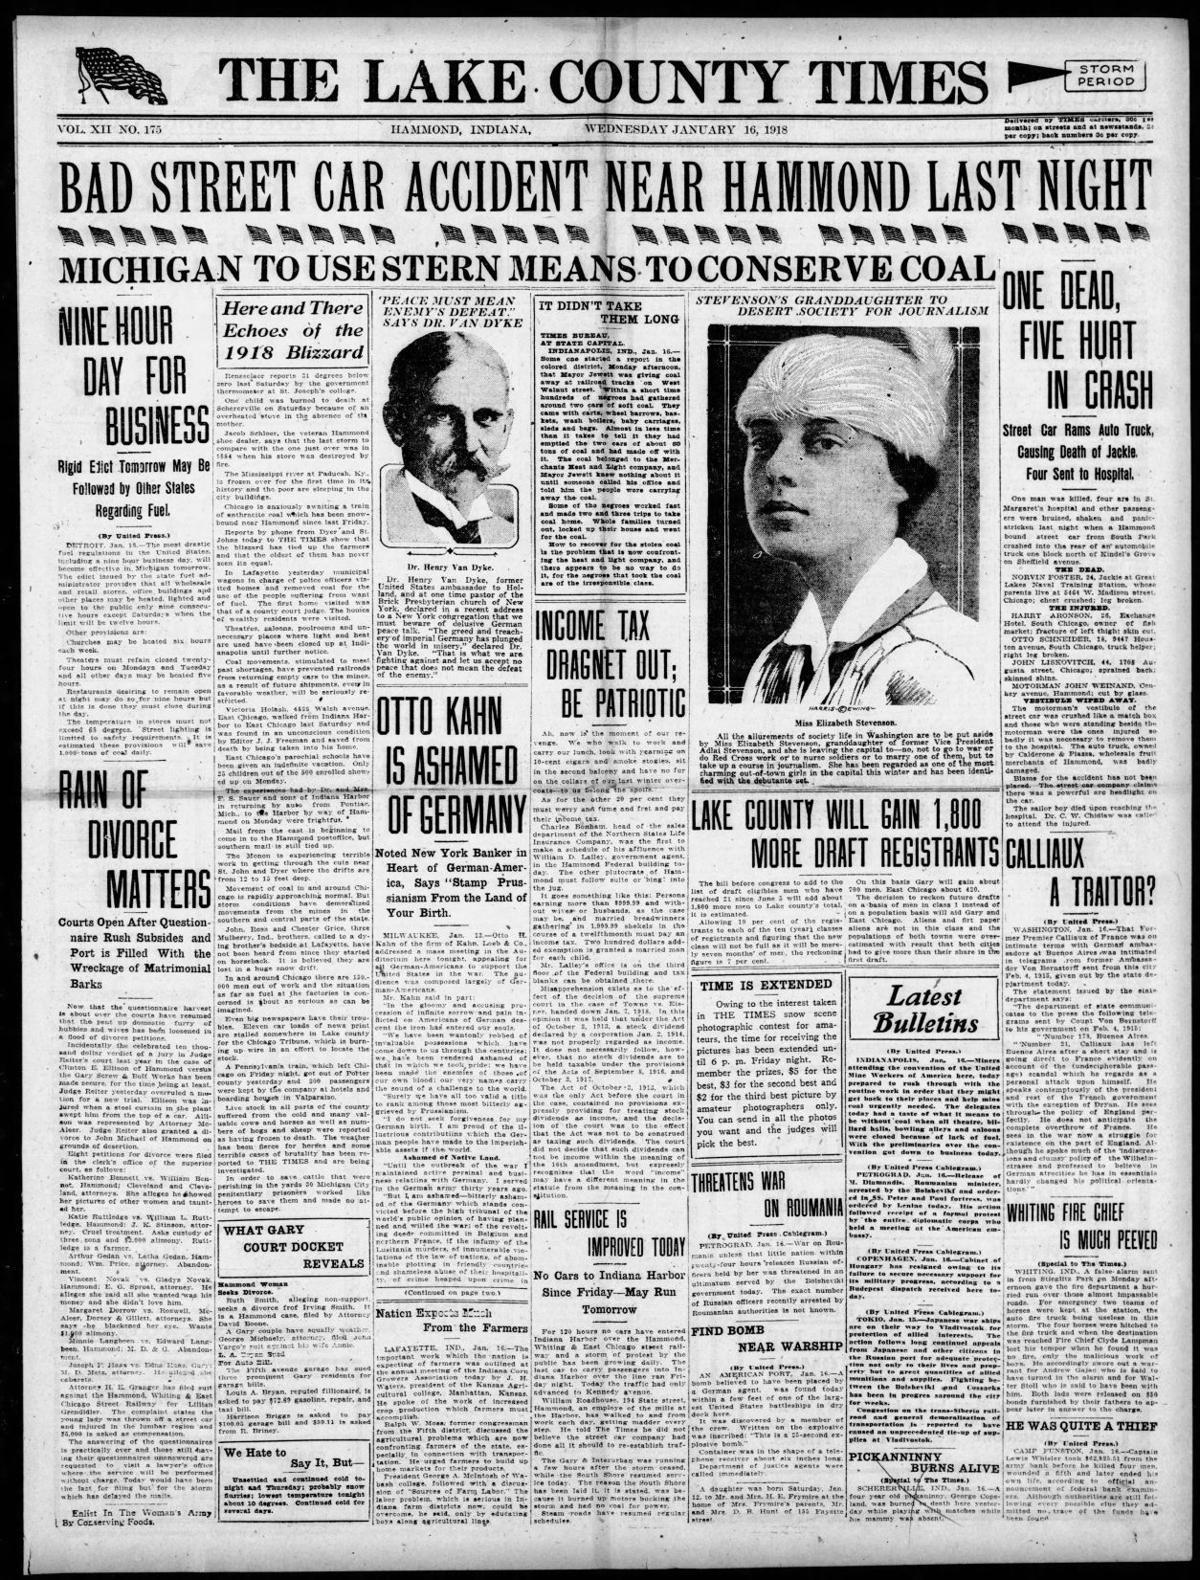 Jan. 16, 1918: Bad Street Car Accident Near Hammond Last Night